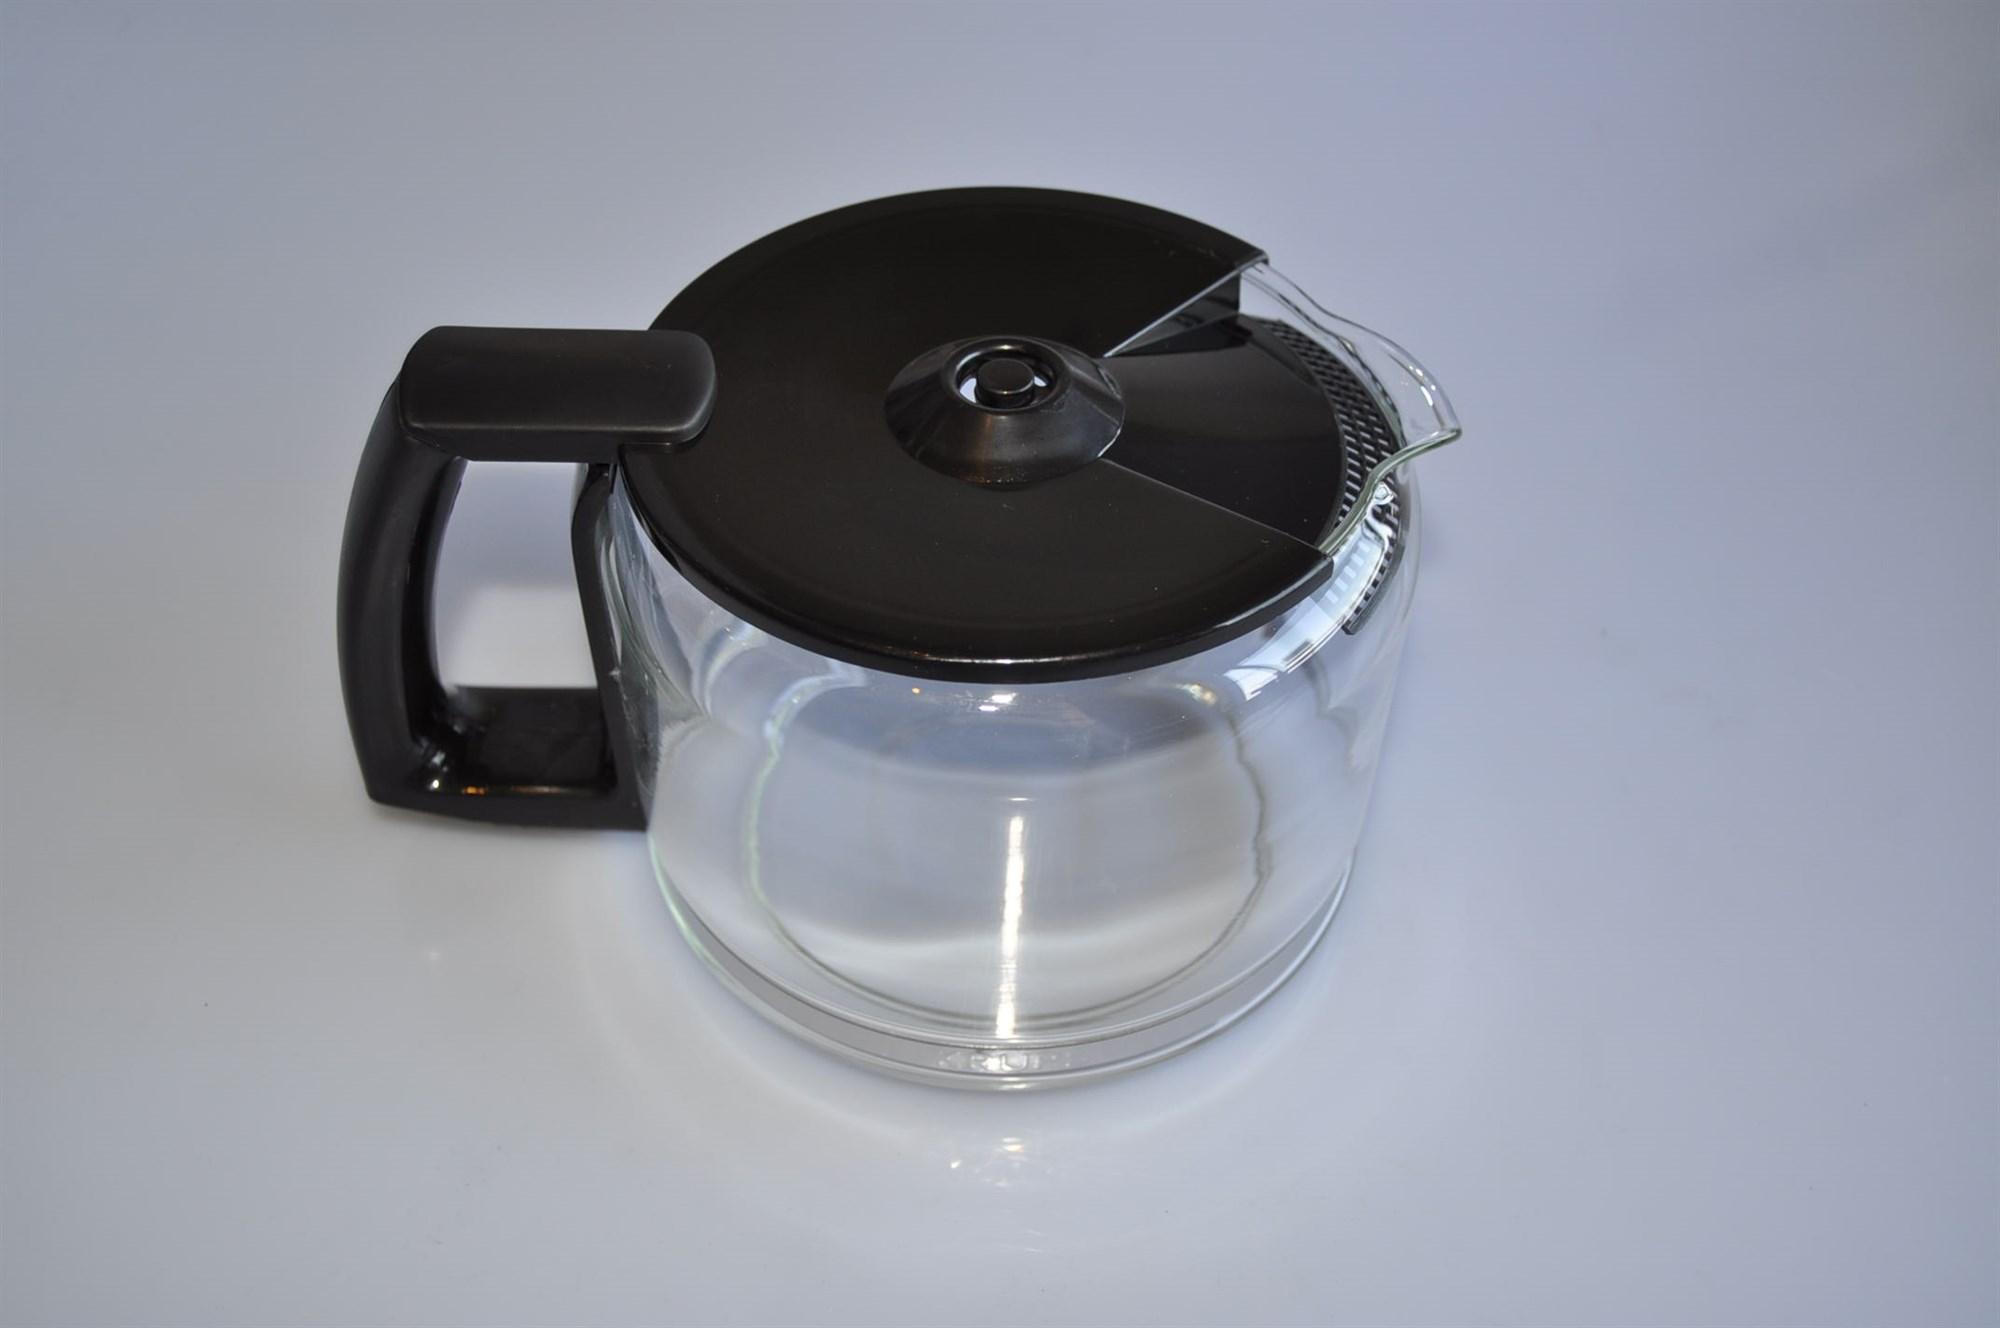 Glass Jug For Coffee Maker : Glass jug, Krups coffee maker - Black